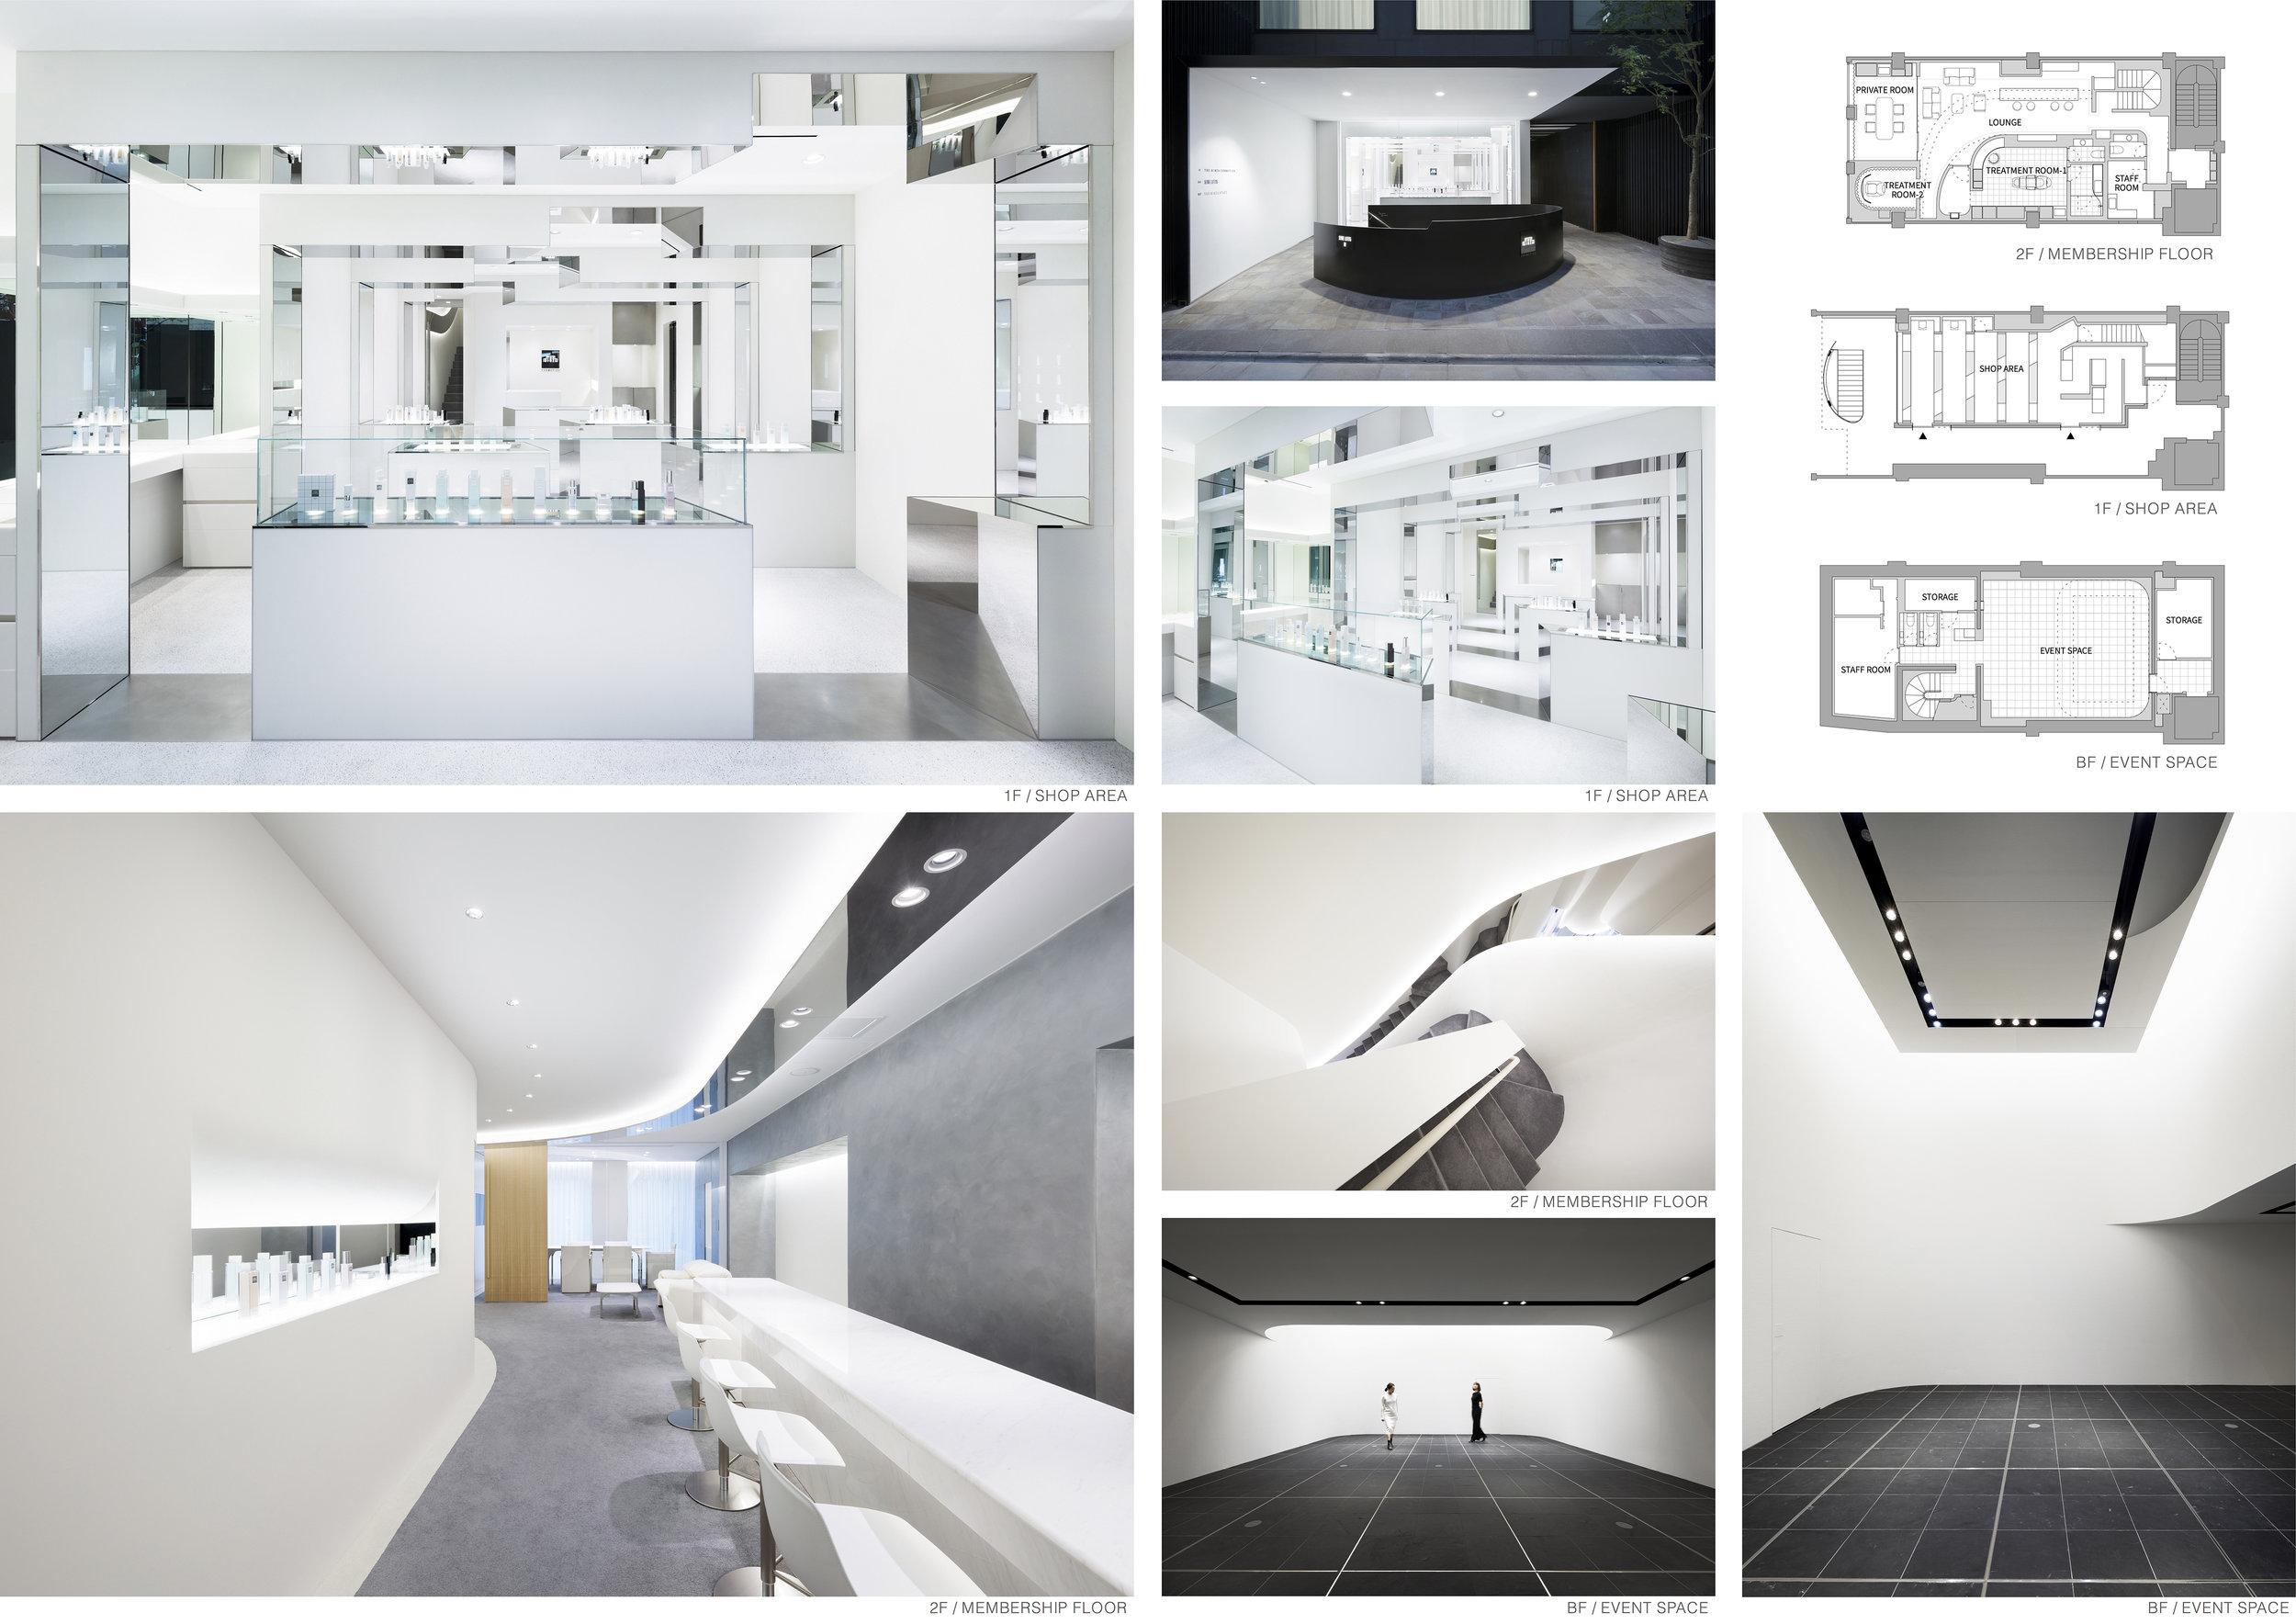 The Ginza Cosmetics - Design by: ODS/ Oniki Design StudioInterior Division: Retail DesignWebsite: http://oniki-design-studio.com/